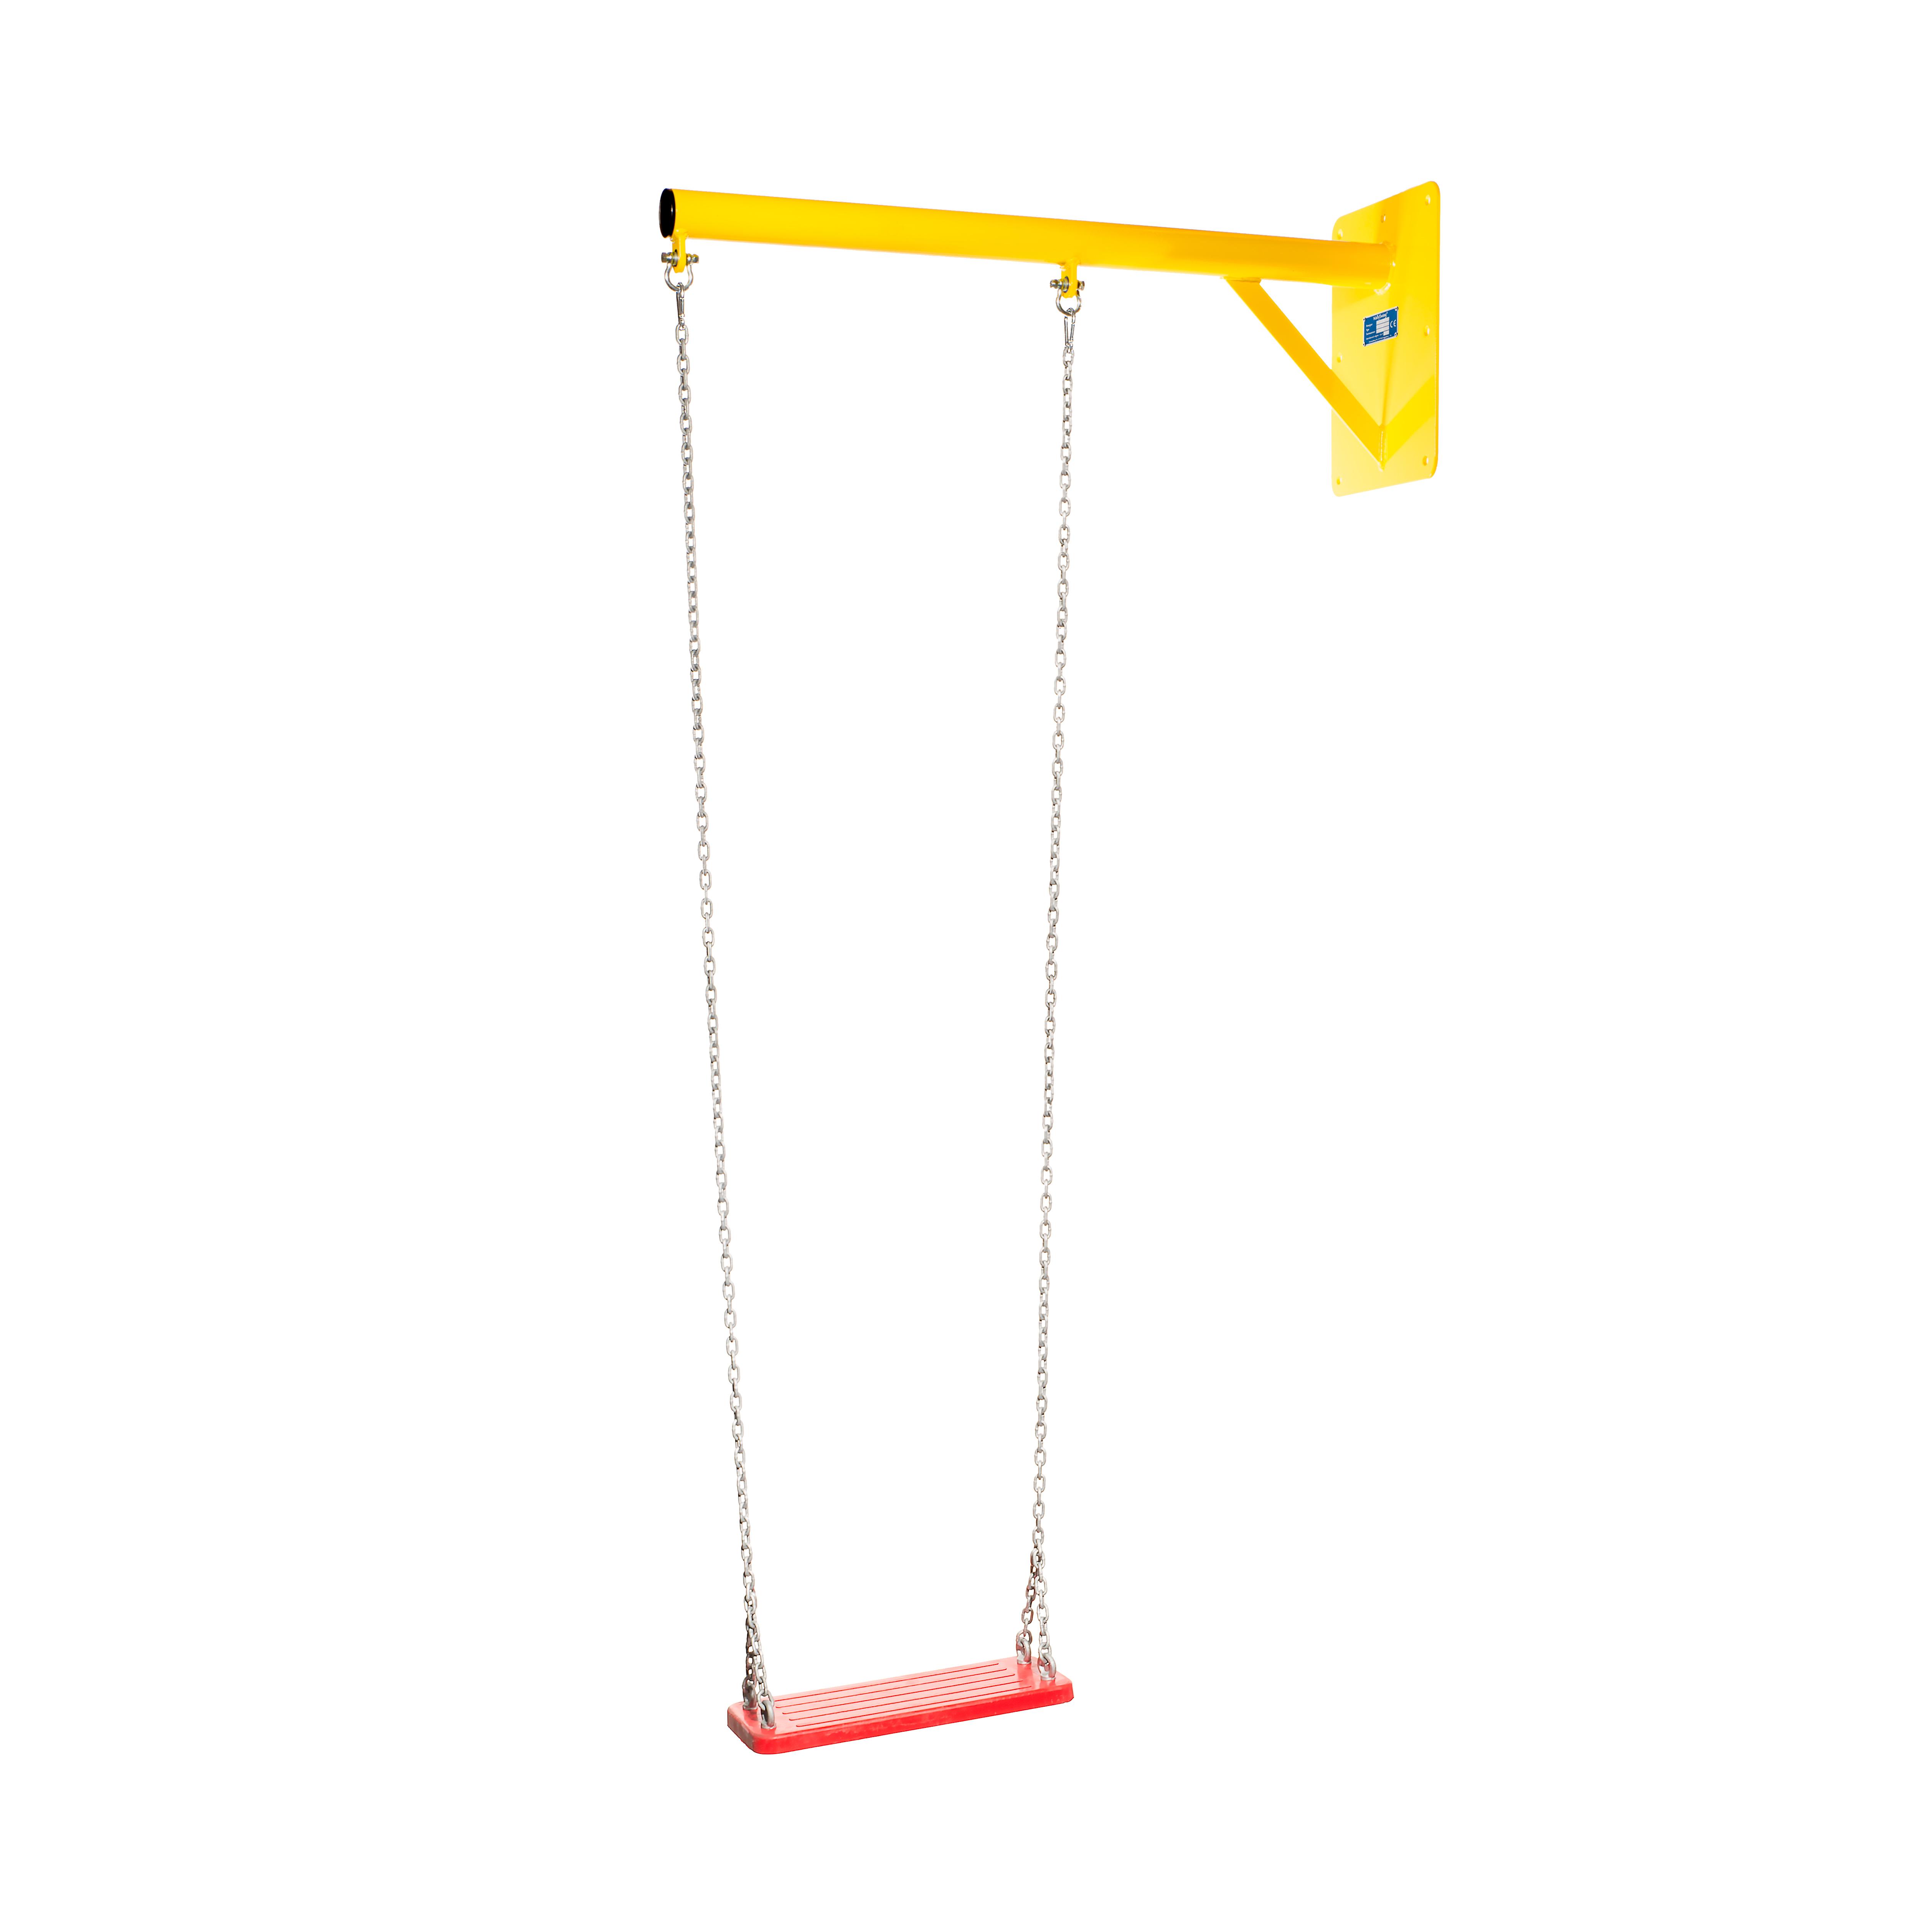 WallySwing®-muurschommel-schommel-gevelschommel-schommelbeugel-onbehandeld-garantie-aanbieding-schommelbeugel